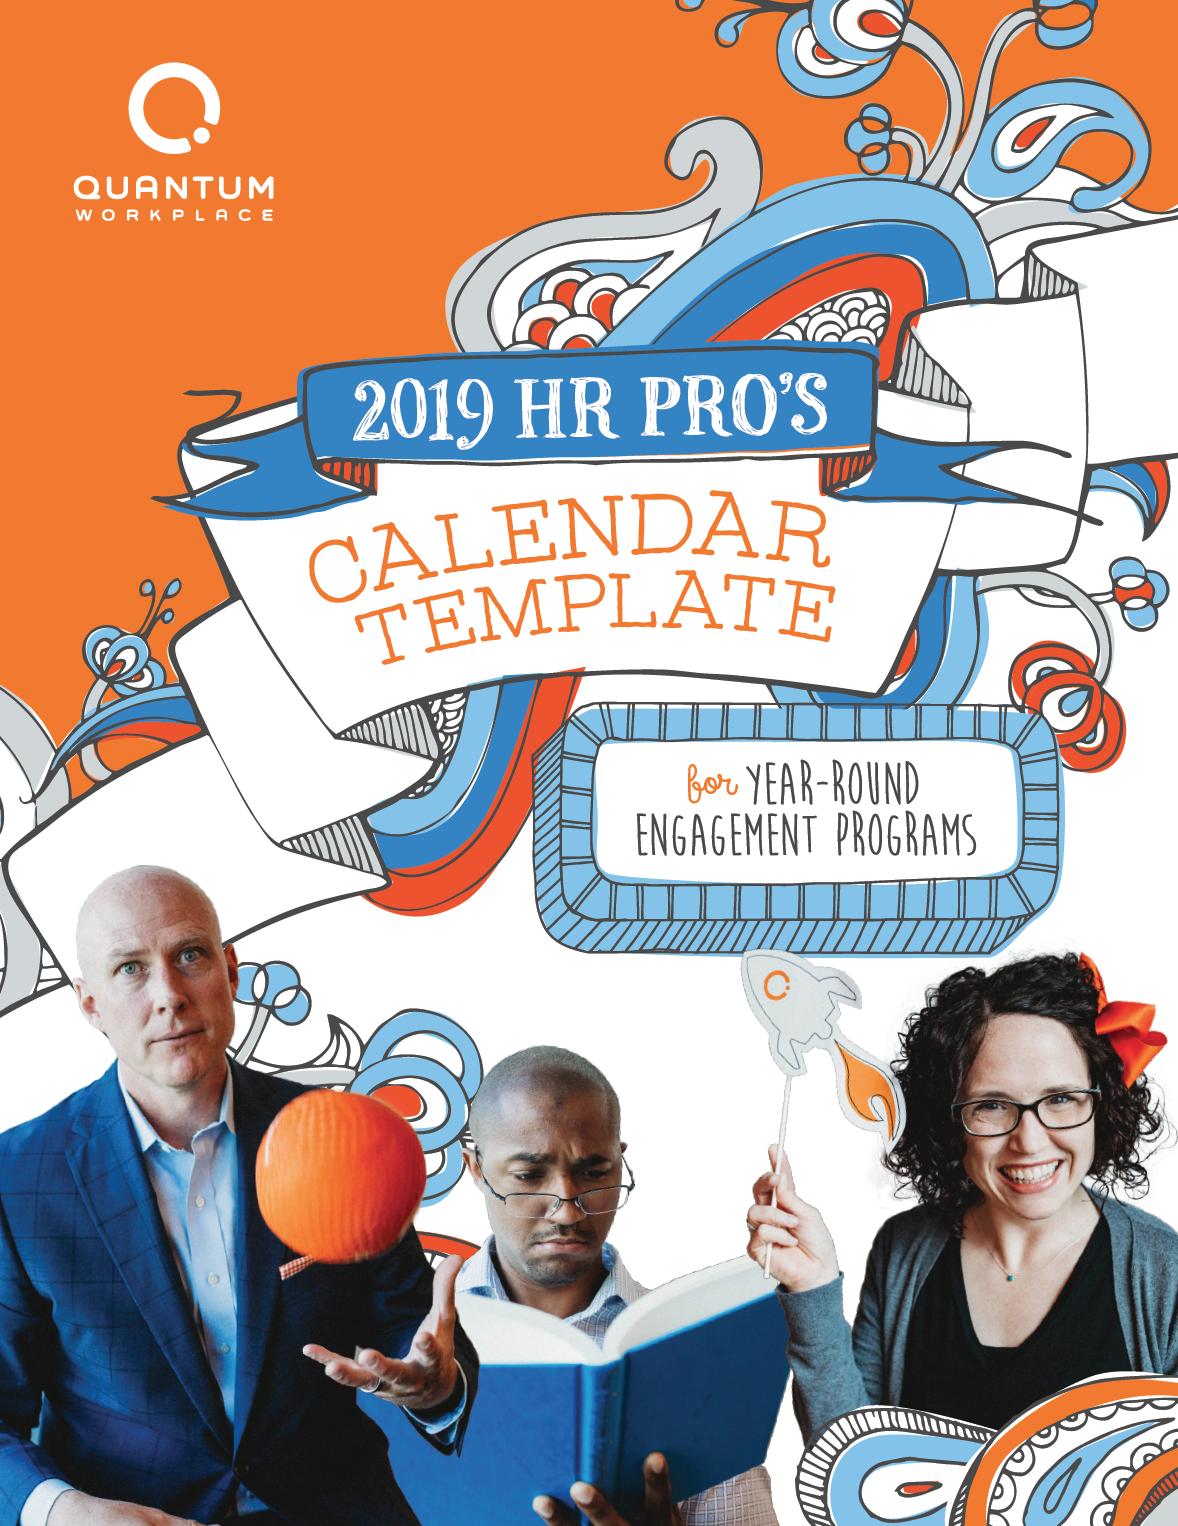 The 2019 HR Pro Calendar Template.png